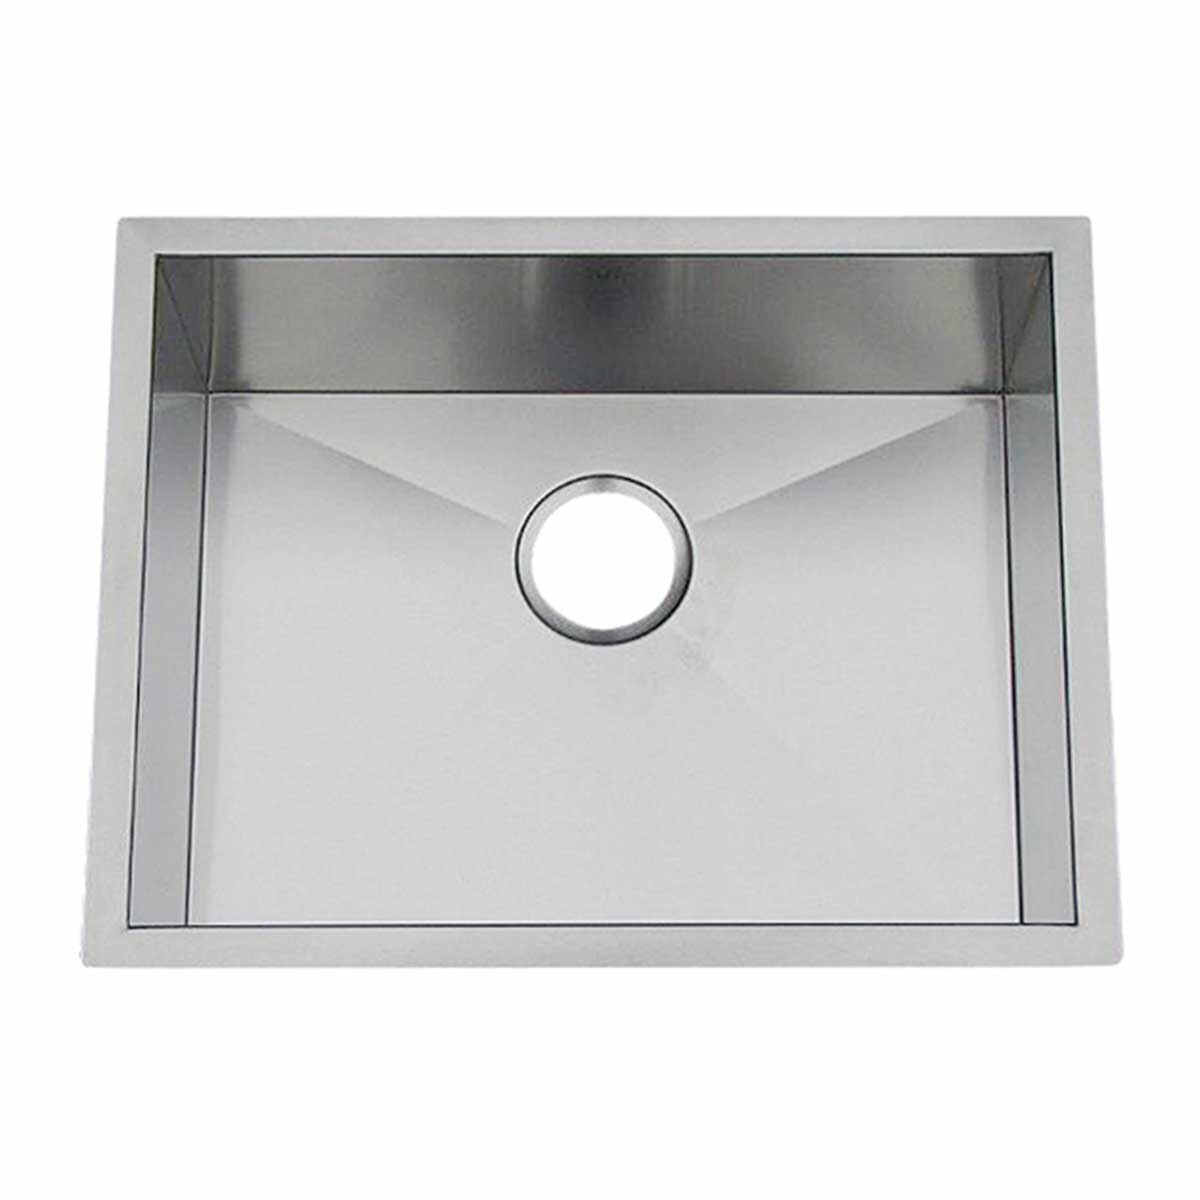 Artisan CPUZ2319-D10 Chef Pro Single Bowl Stainless Steel Undermount Sink